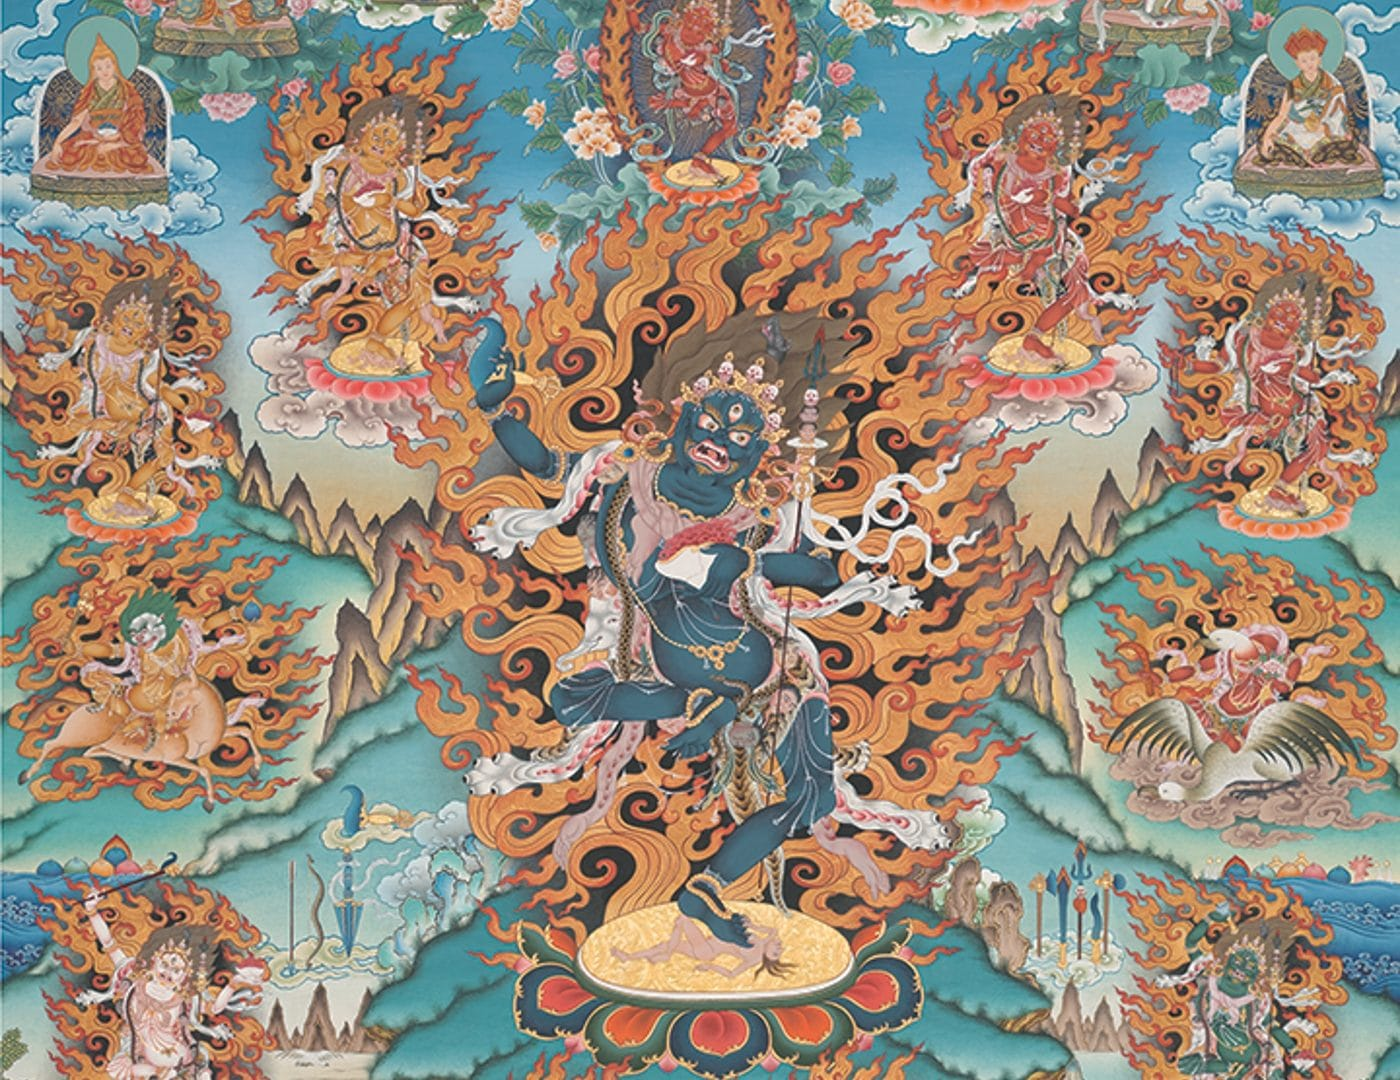 Práctica de T'röma en honor a Kyabjé Dungse Shenphen Dawa Norbu Rimpoché